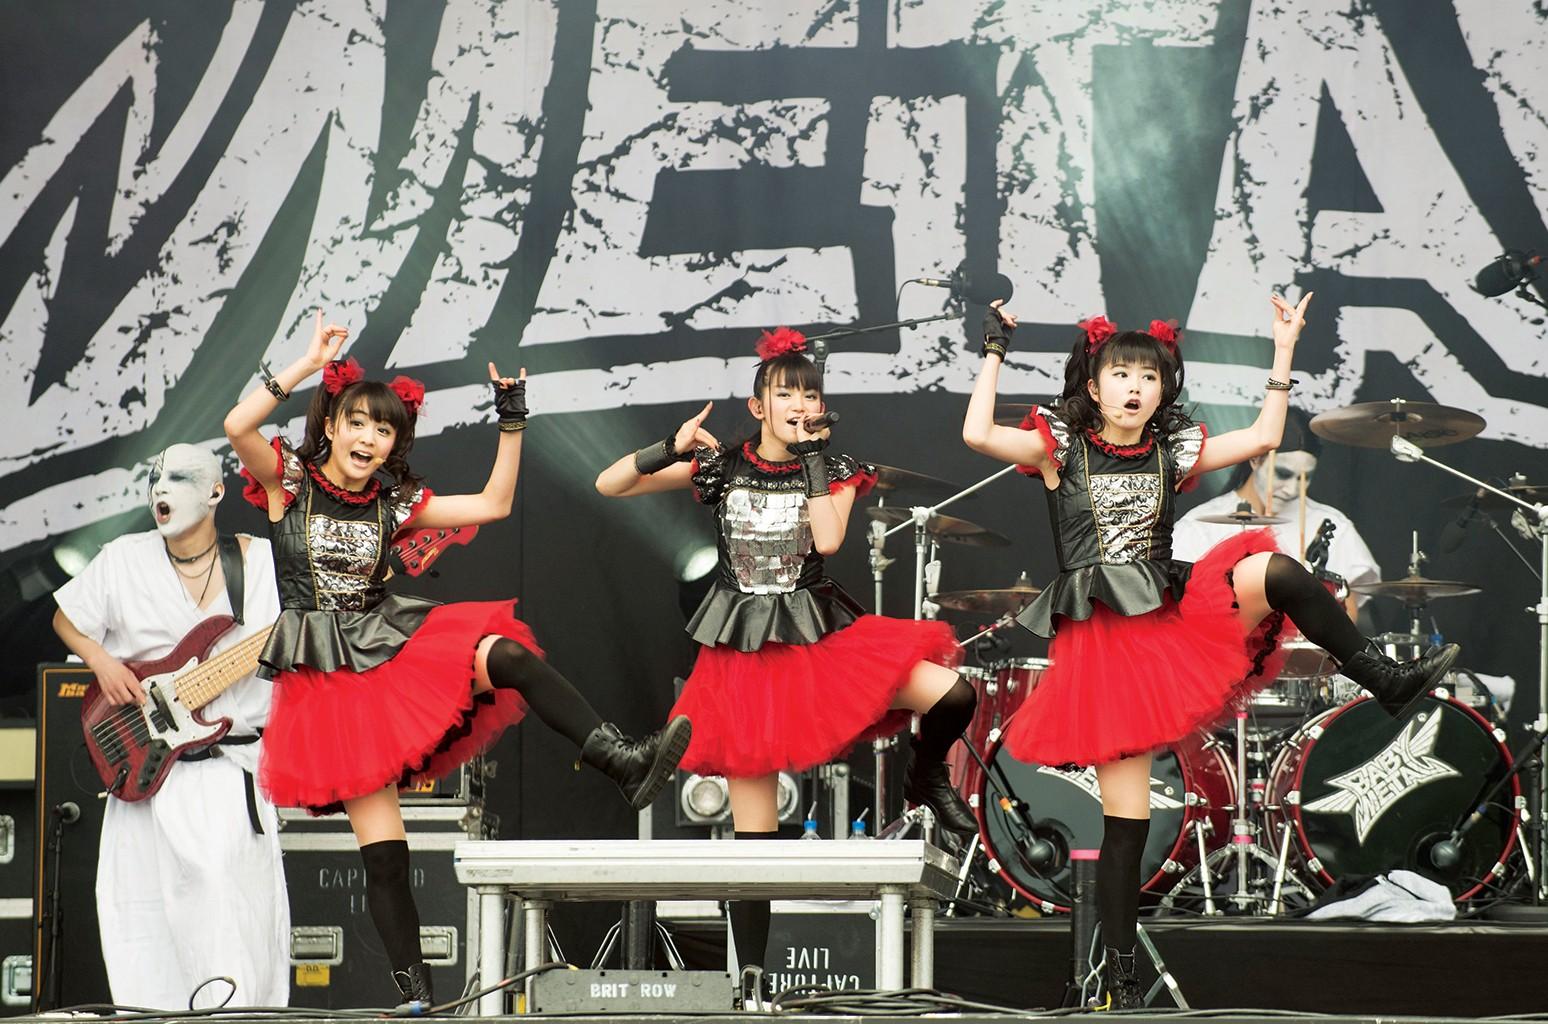 Babymetal onstage in Gelsenkirchen, Germany, in 2015.